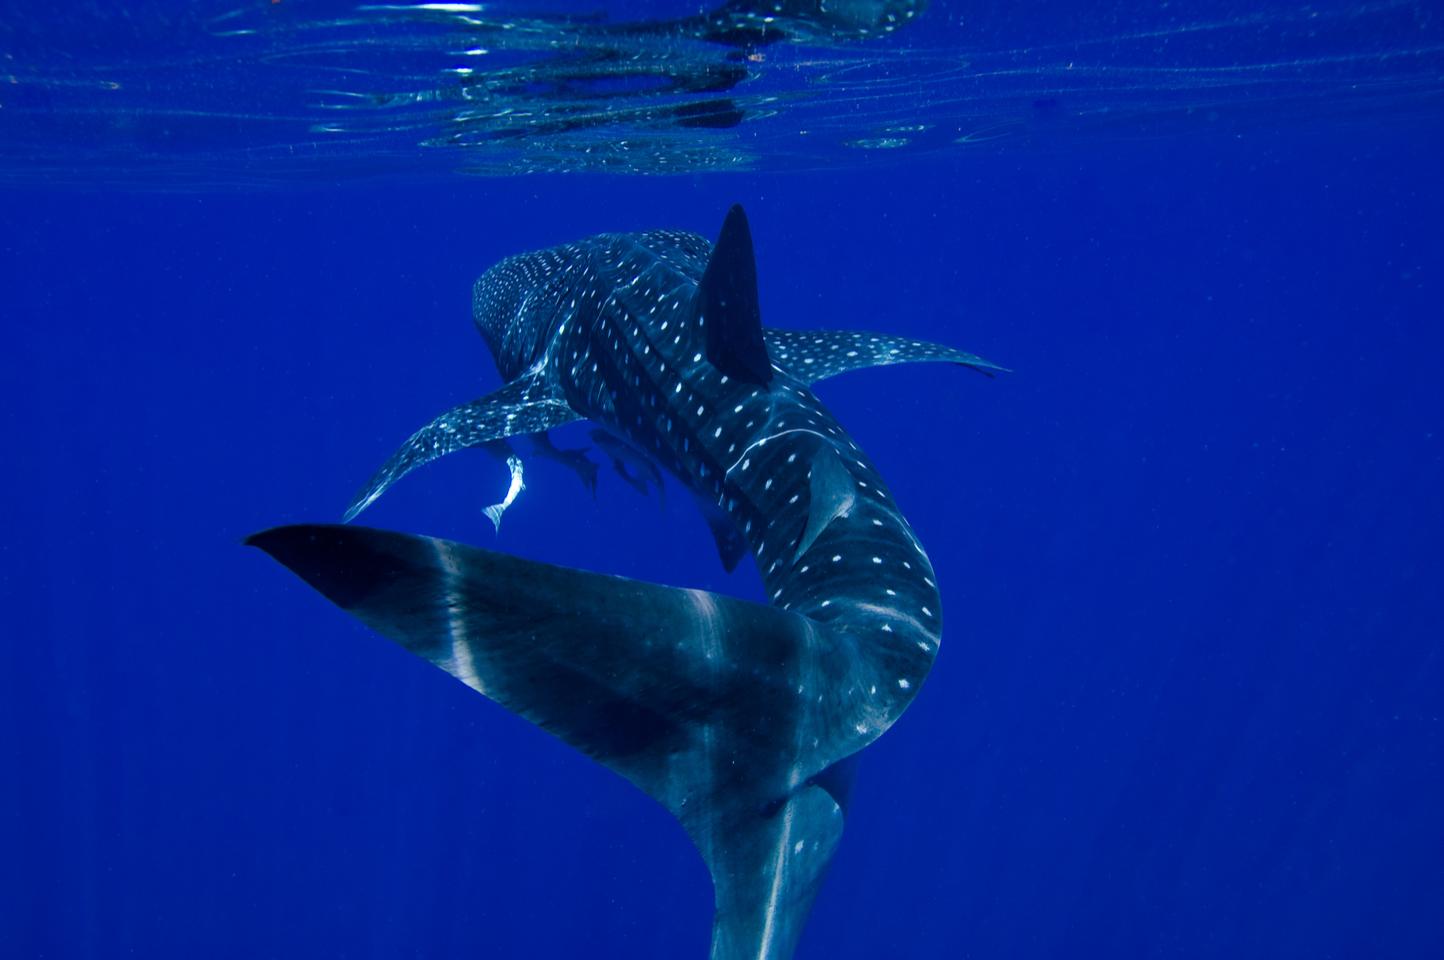 Whale Shark near Exmouth